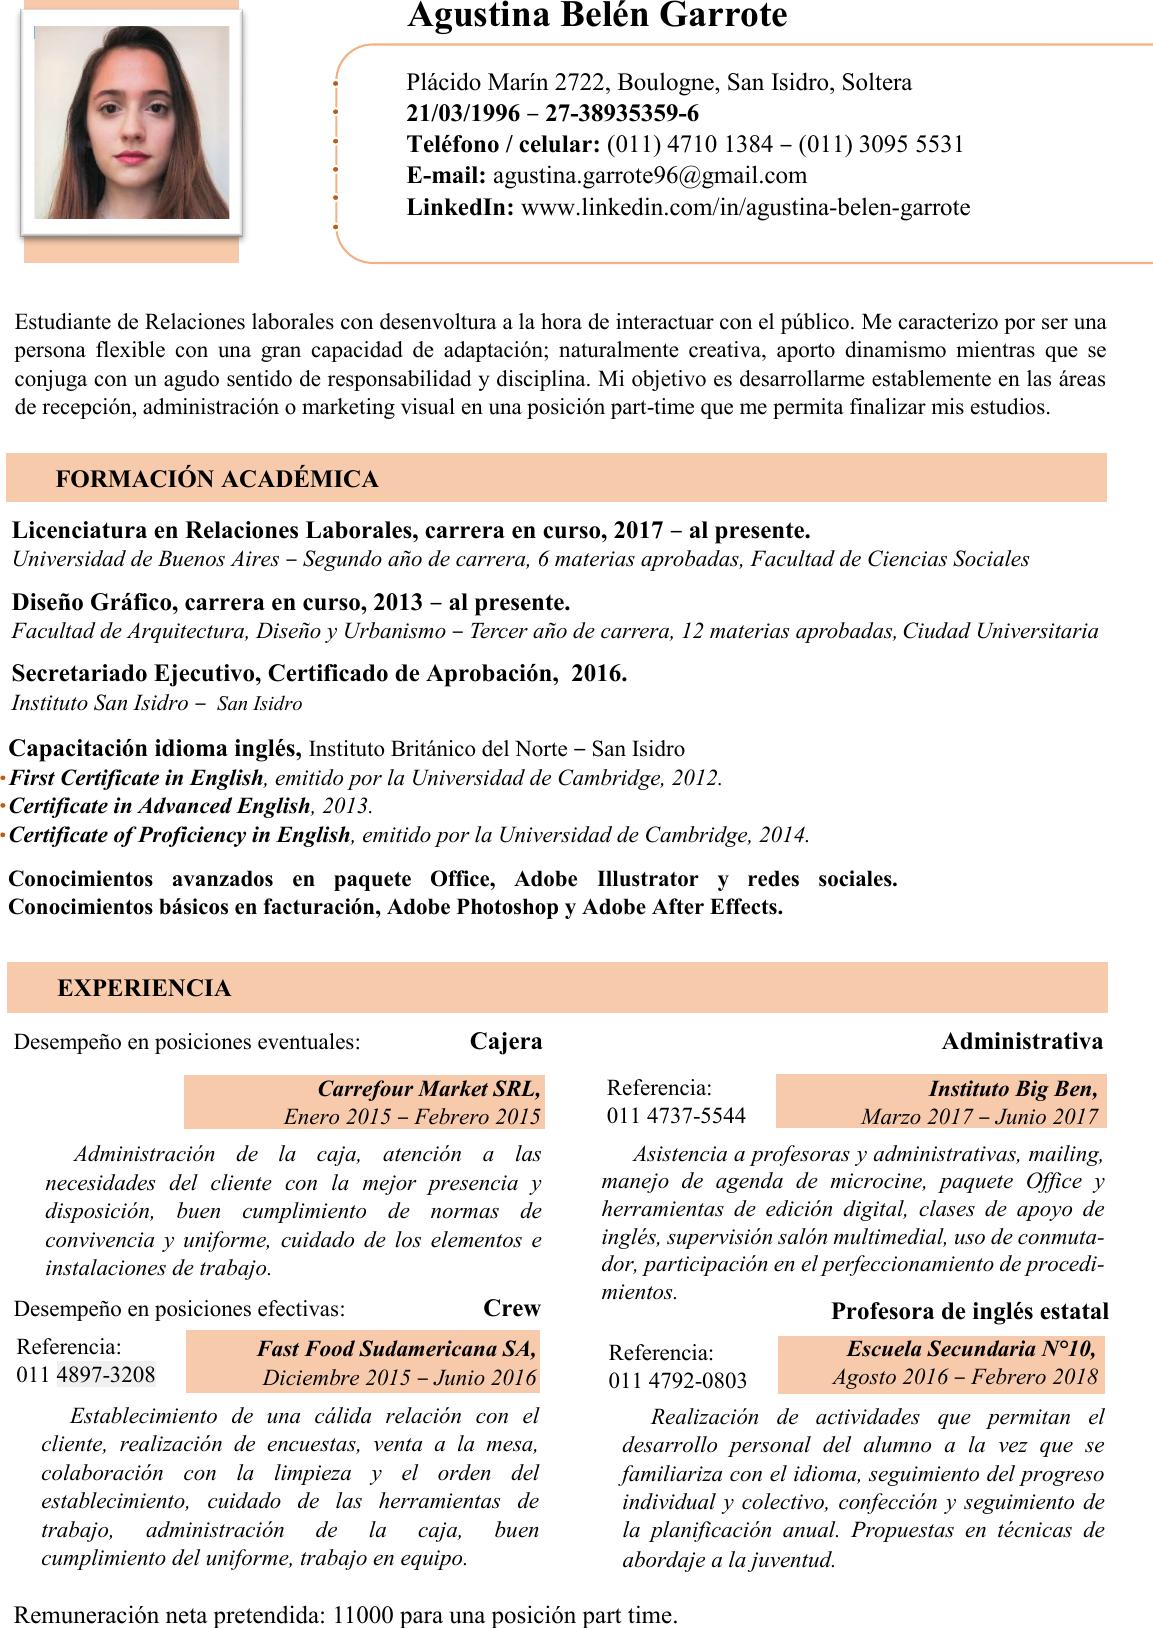 curriculum guide in english pdf